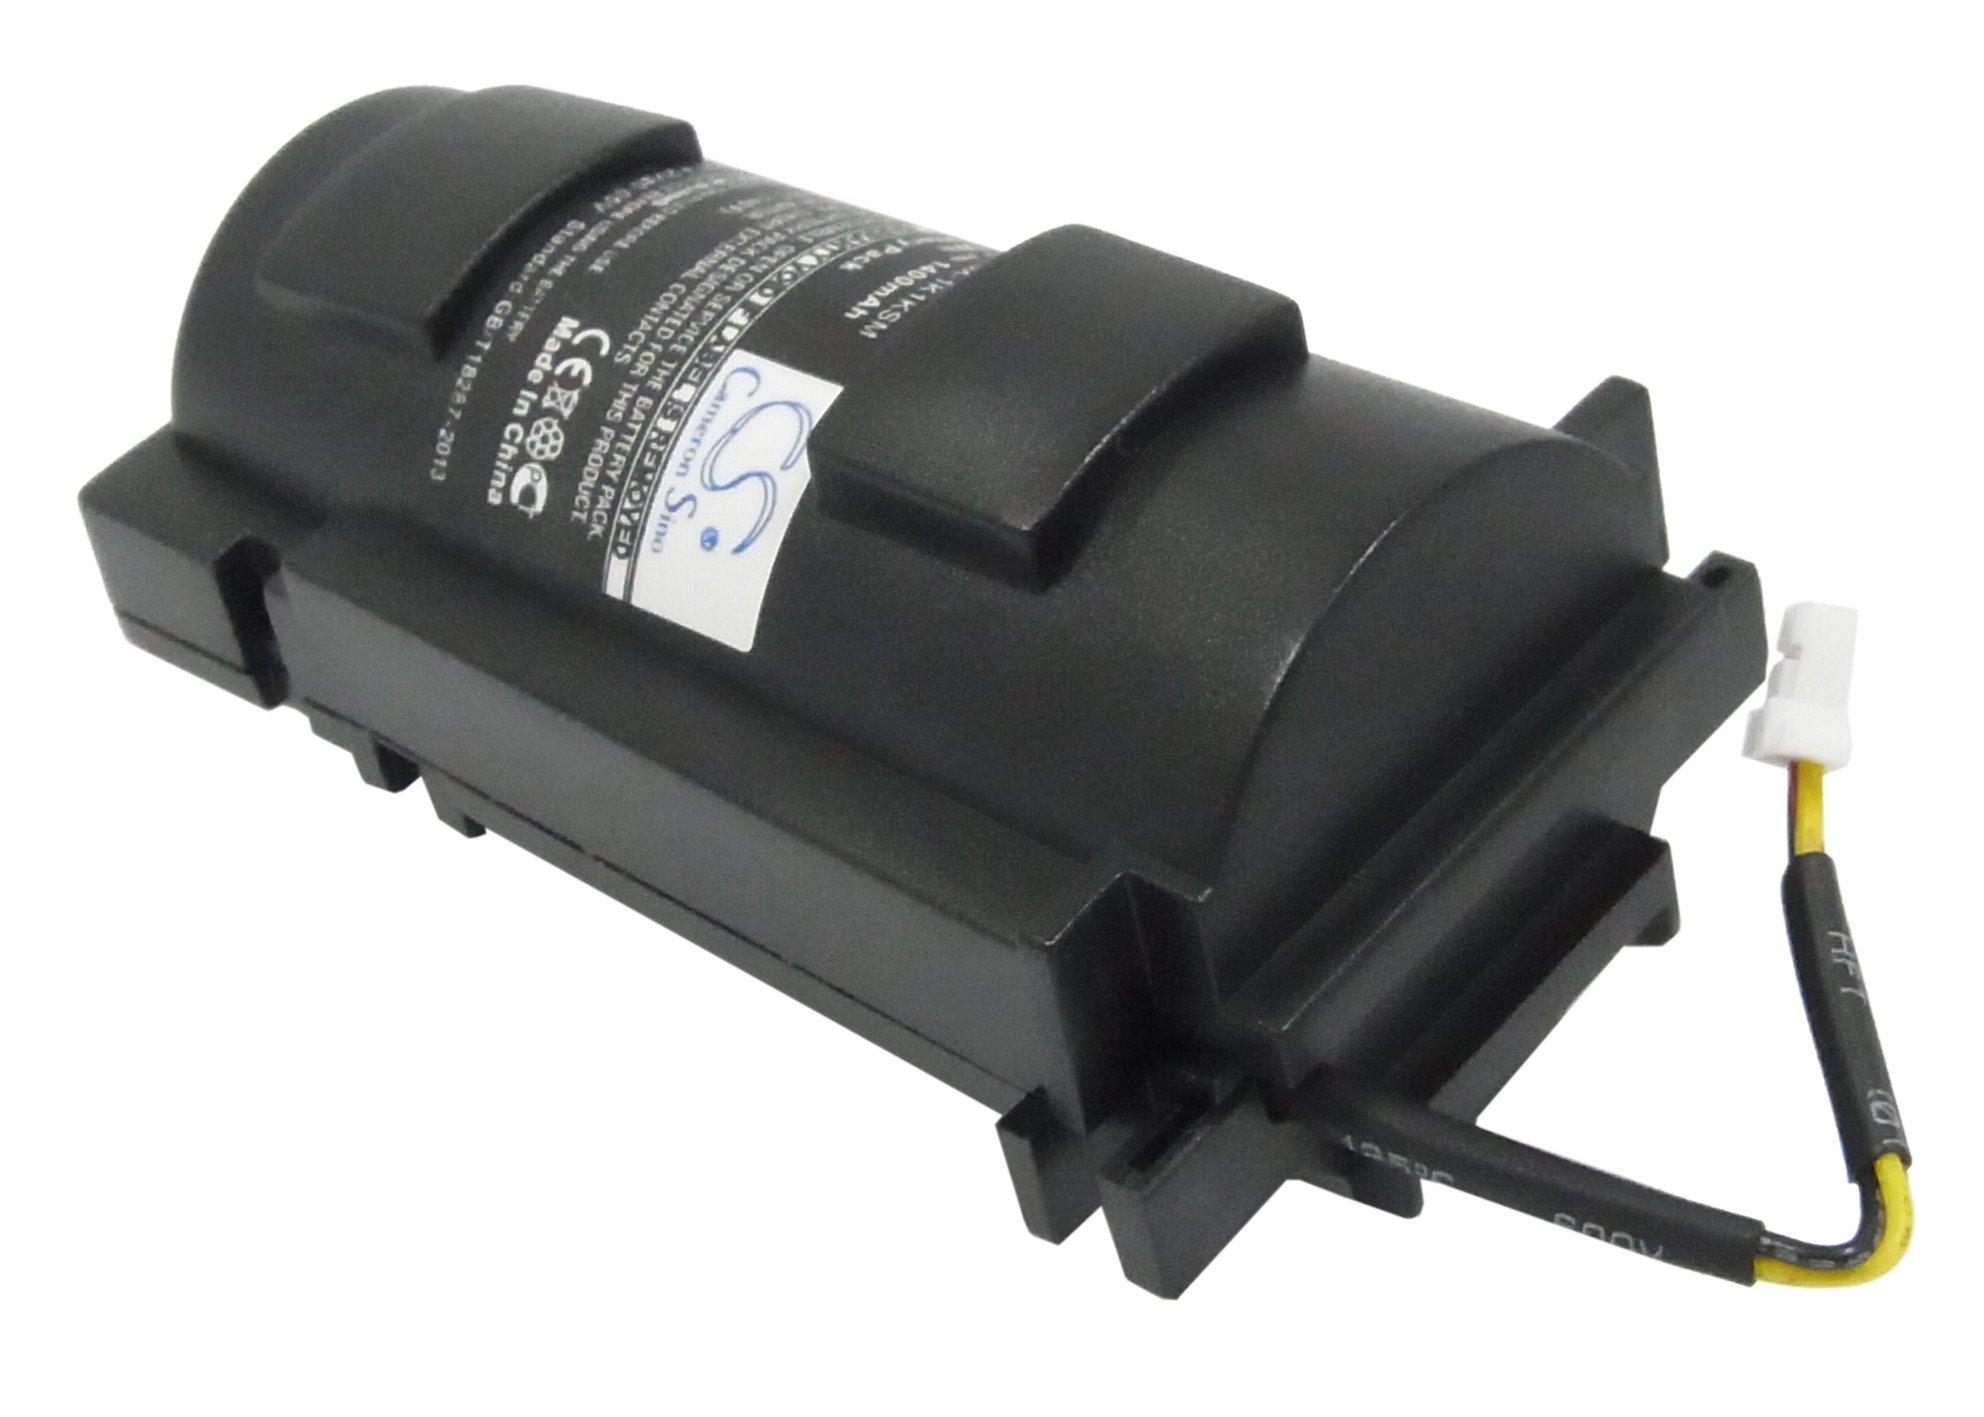 Cameron Sino Rechargeble Battery for Metrologic 00-06260A